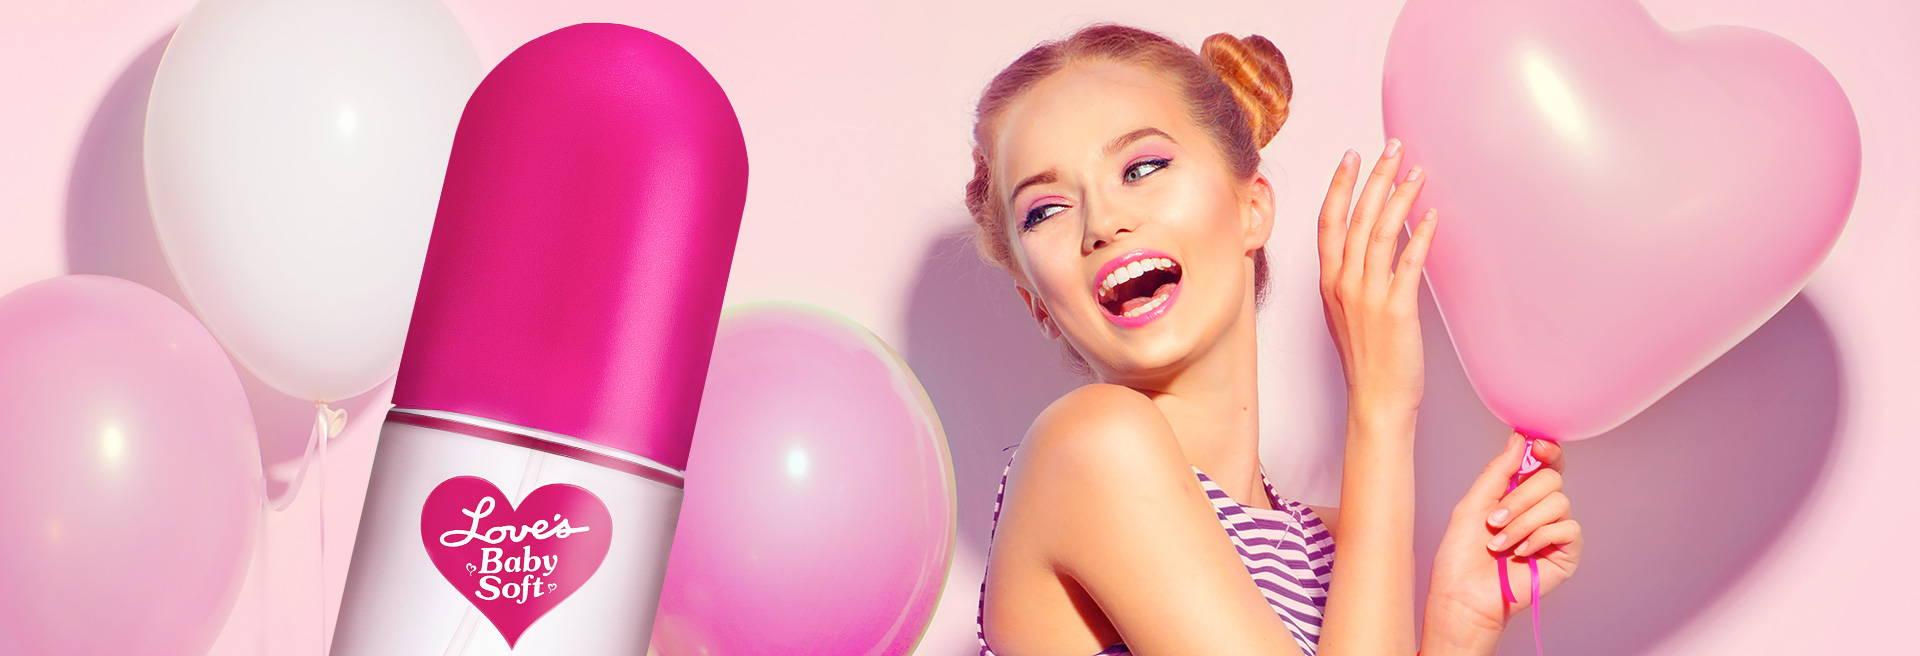 Love's Baby Soft bottle, happy girl, balloons